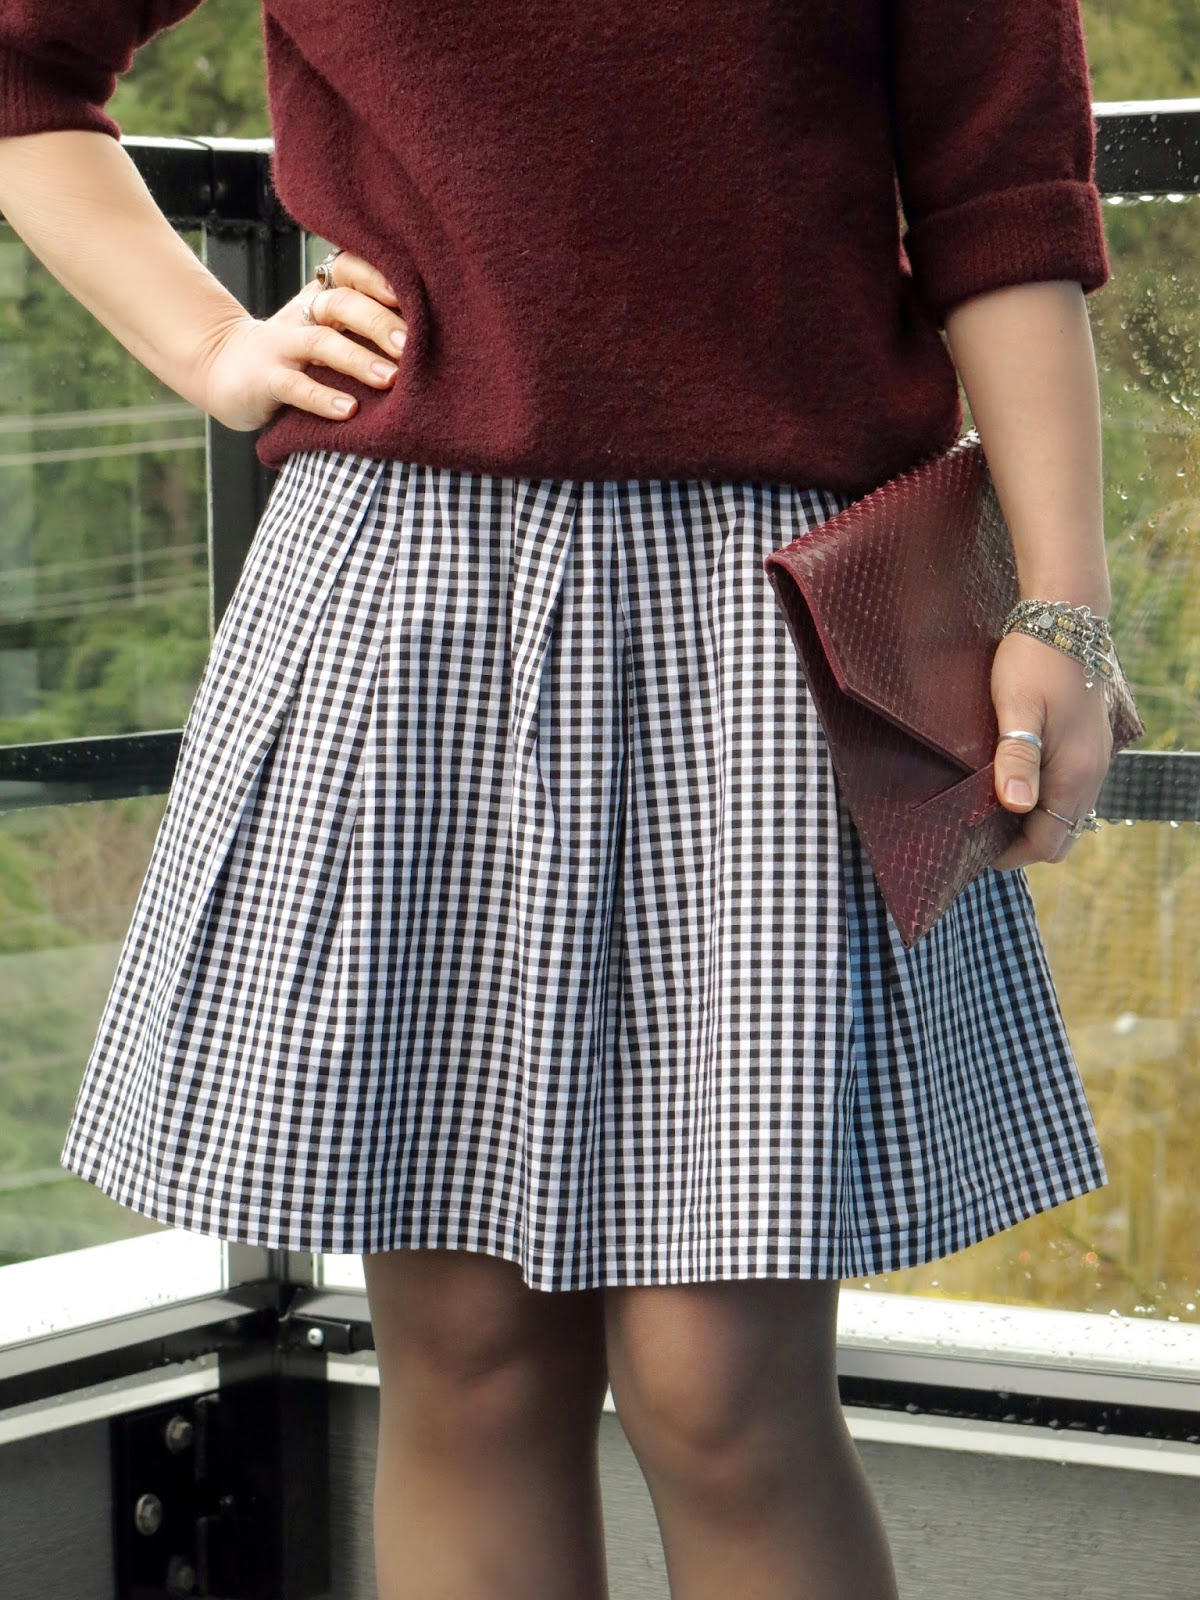 maroon turtleneck, gingham skirt, and faux-snake envelope clutch